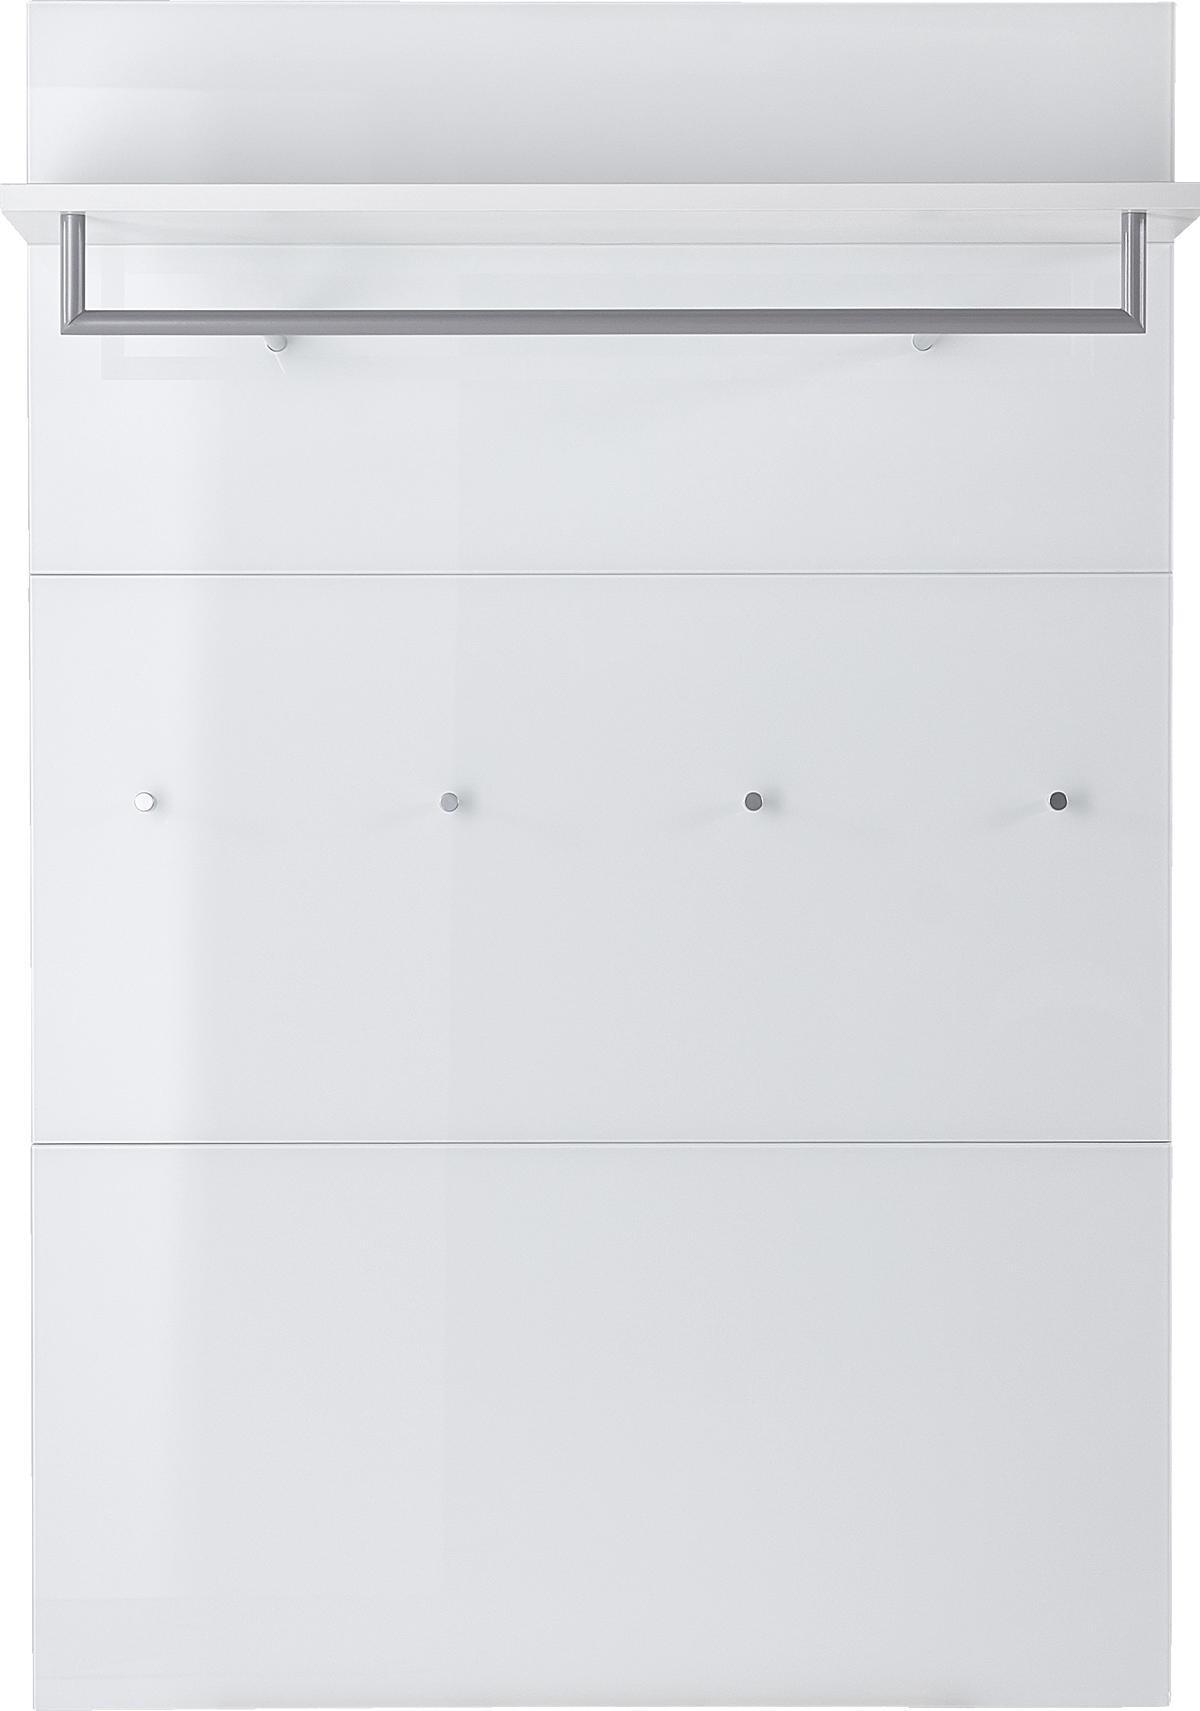 Brilliant Garderobenpaneel Weiß Beste Wahl - Weiß Gm1294. 3763-84_fr_a_cut.jpg